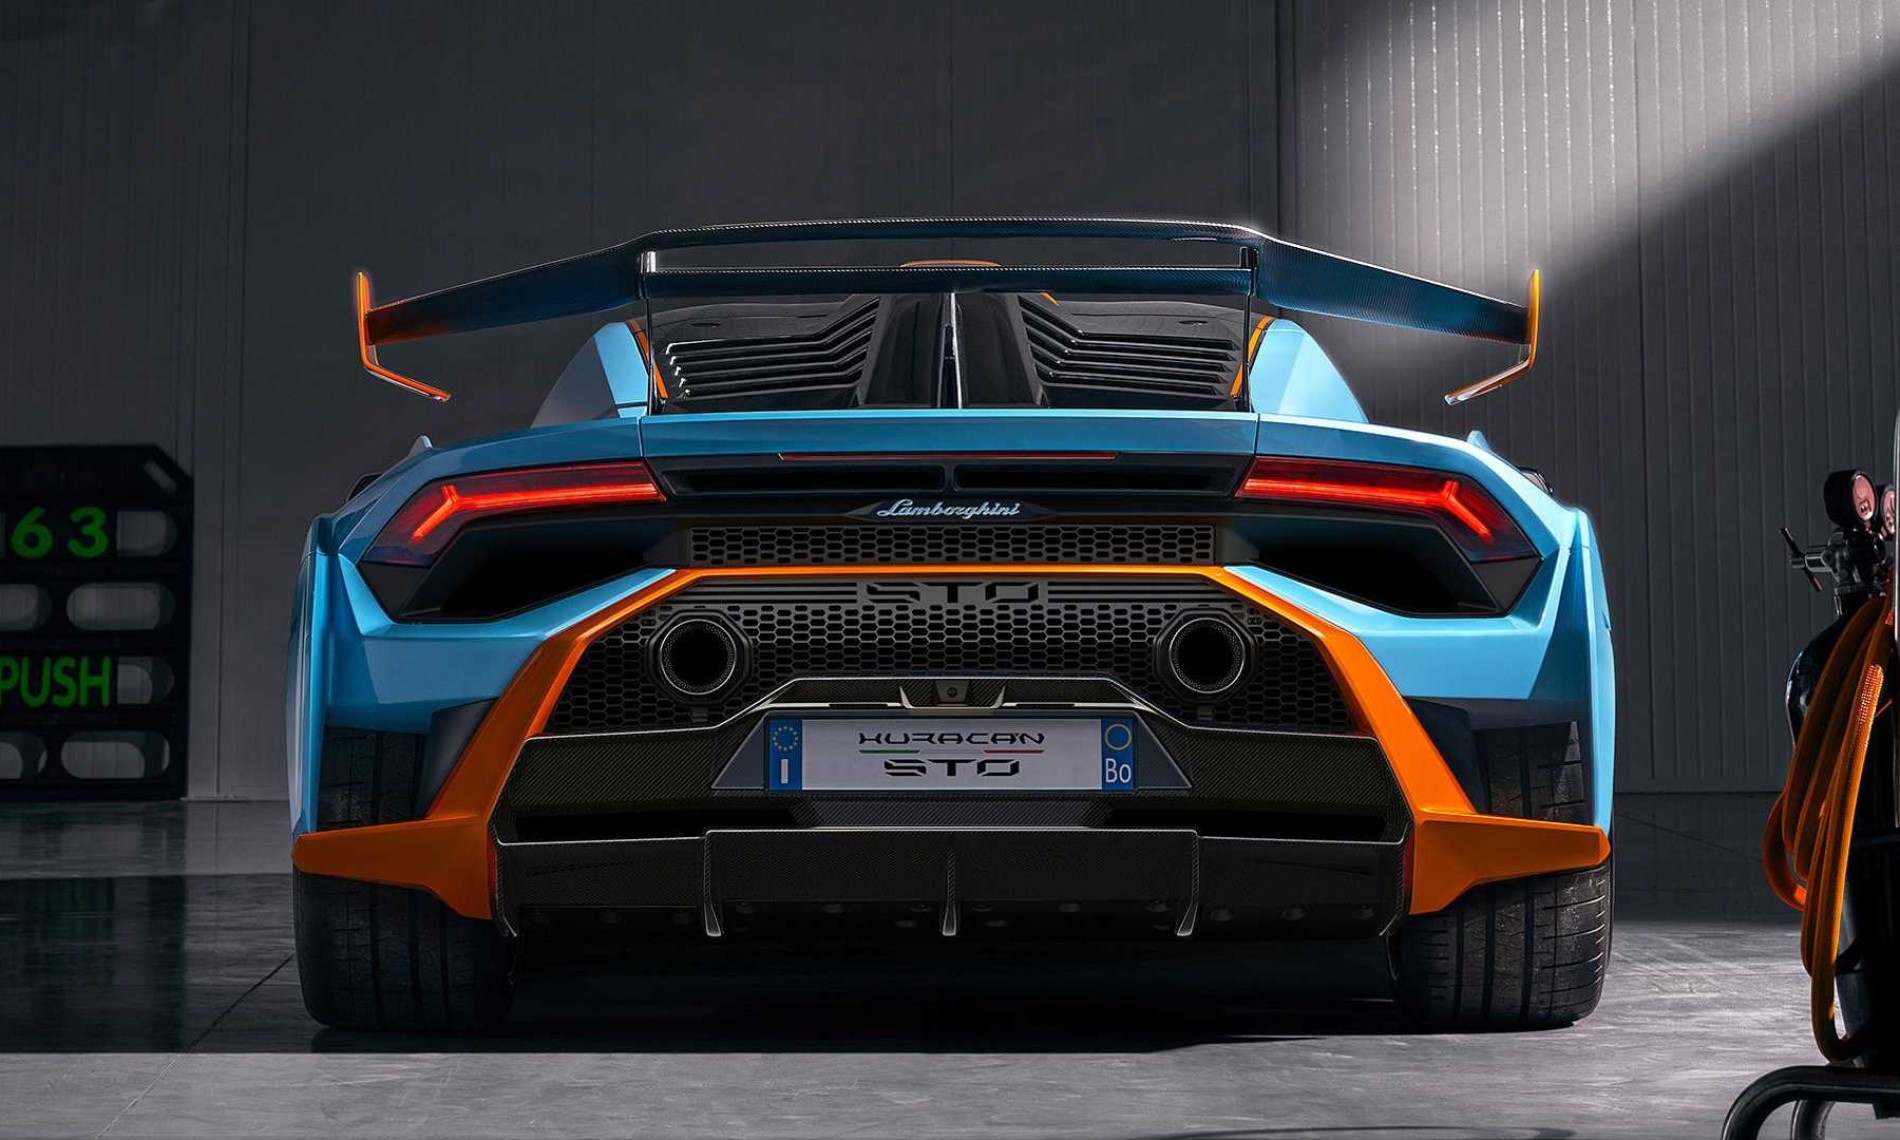 Lamborghini Huracan STO rear 1